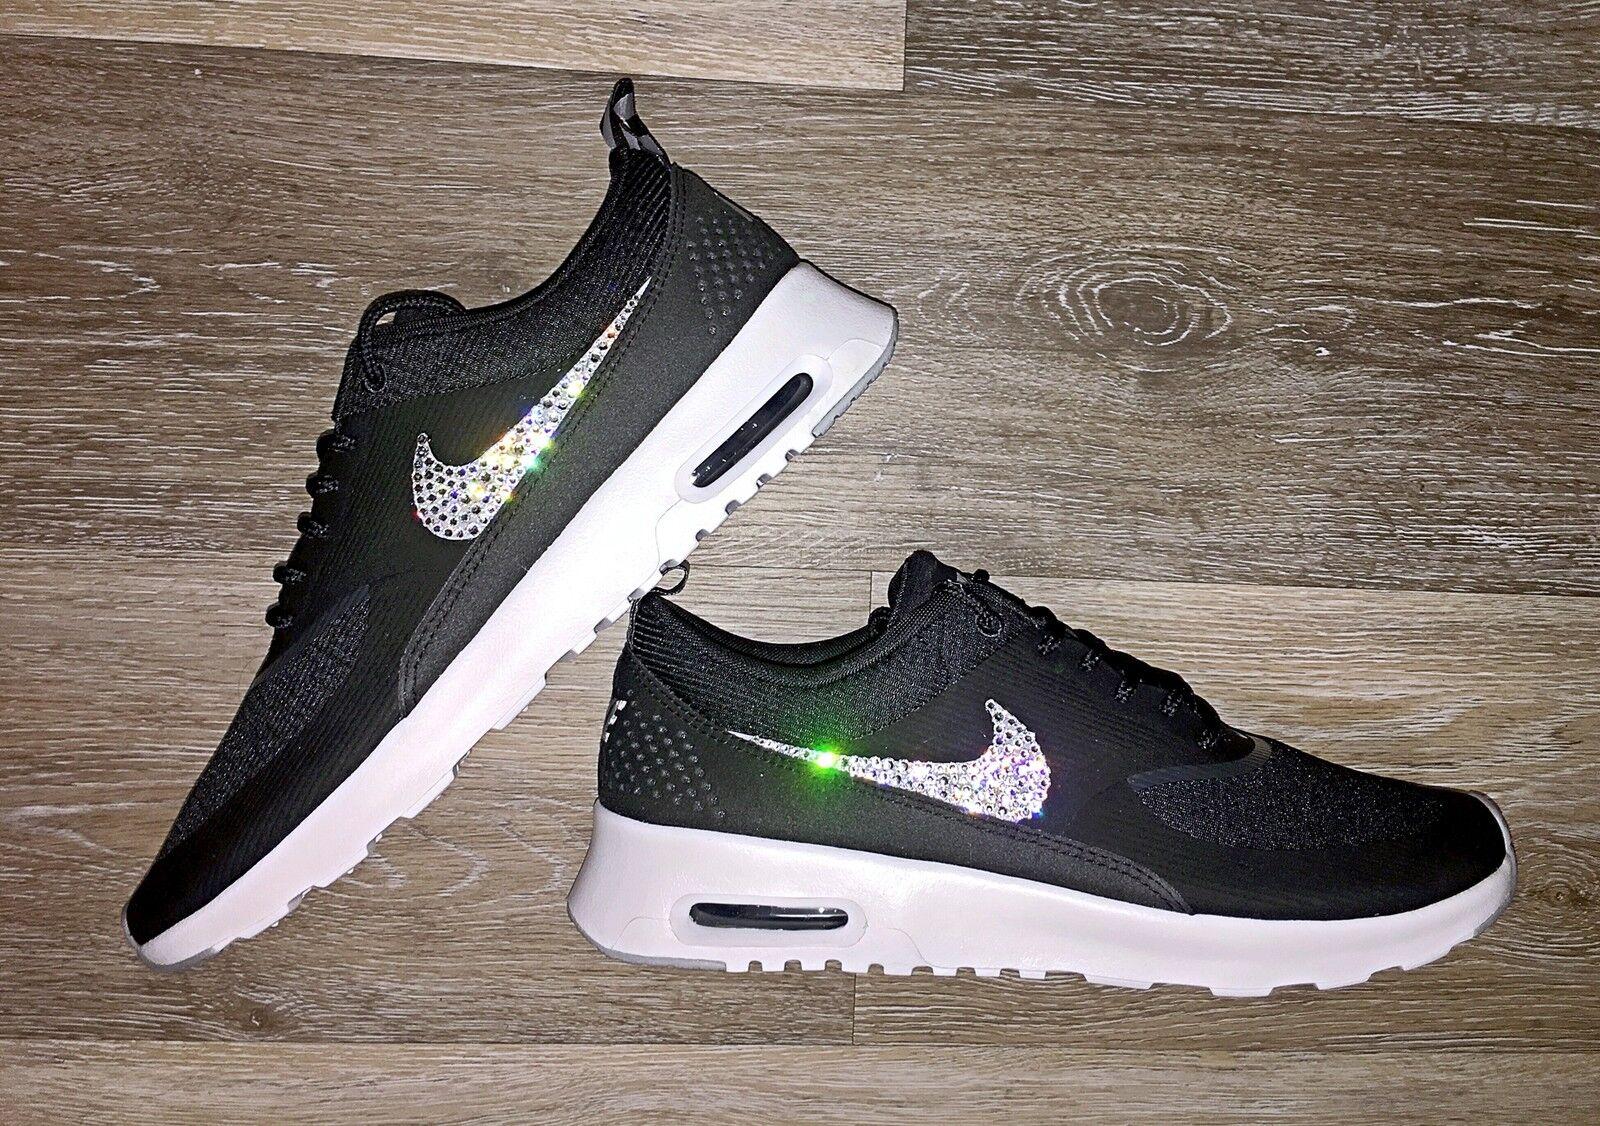 483298c4b5 Nike Air Max Thea W Swarovski Crystals Womens Black nwczqj4948-Athletic  Shoes